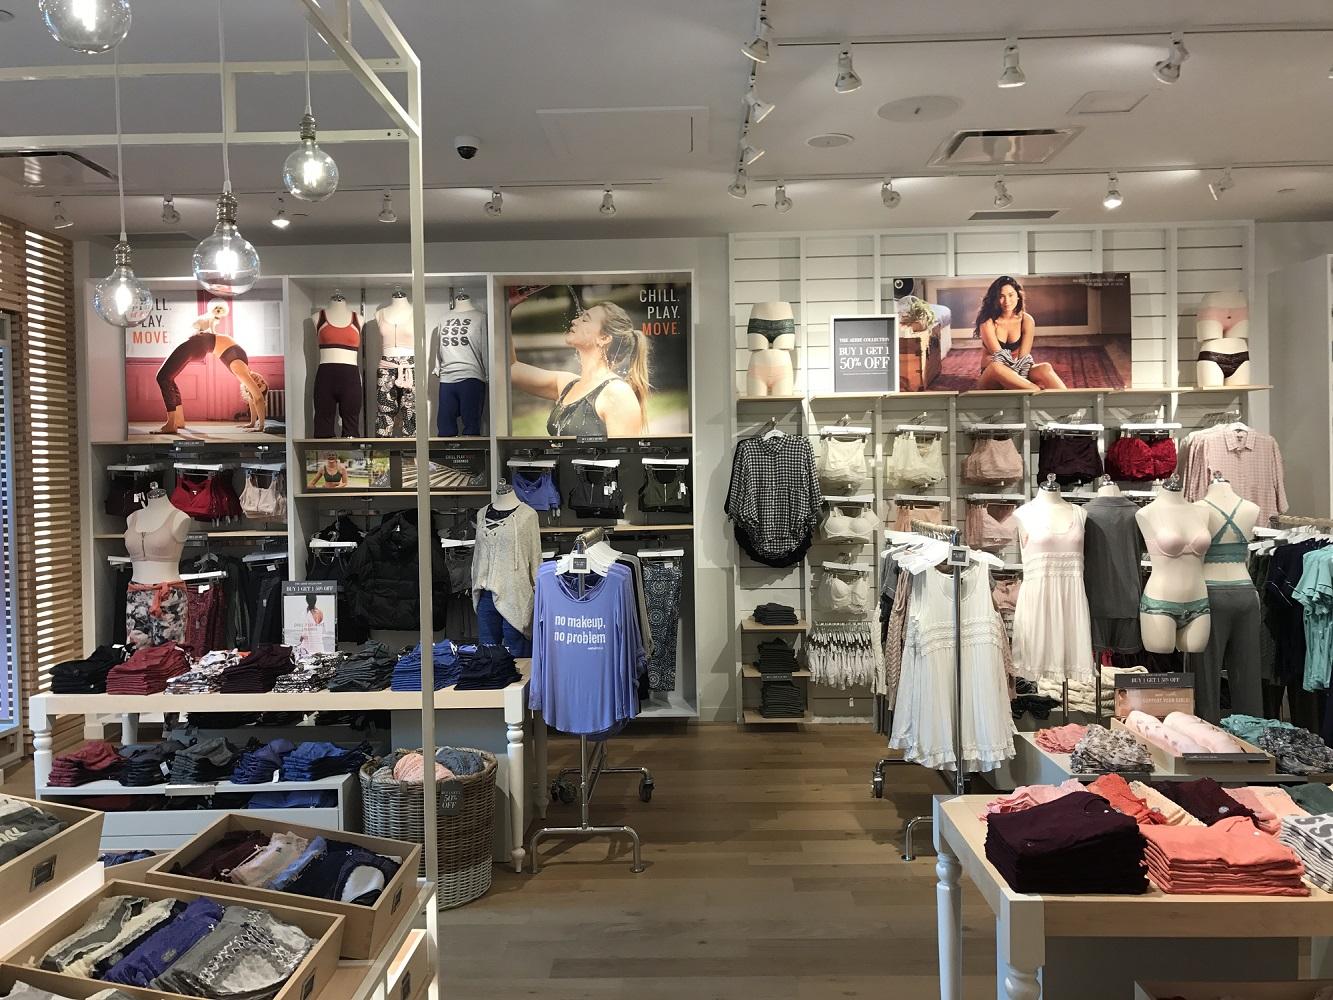 Interior - Clothes Shelves 4.jpg